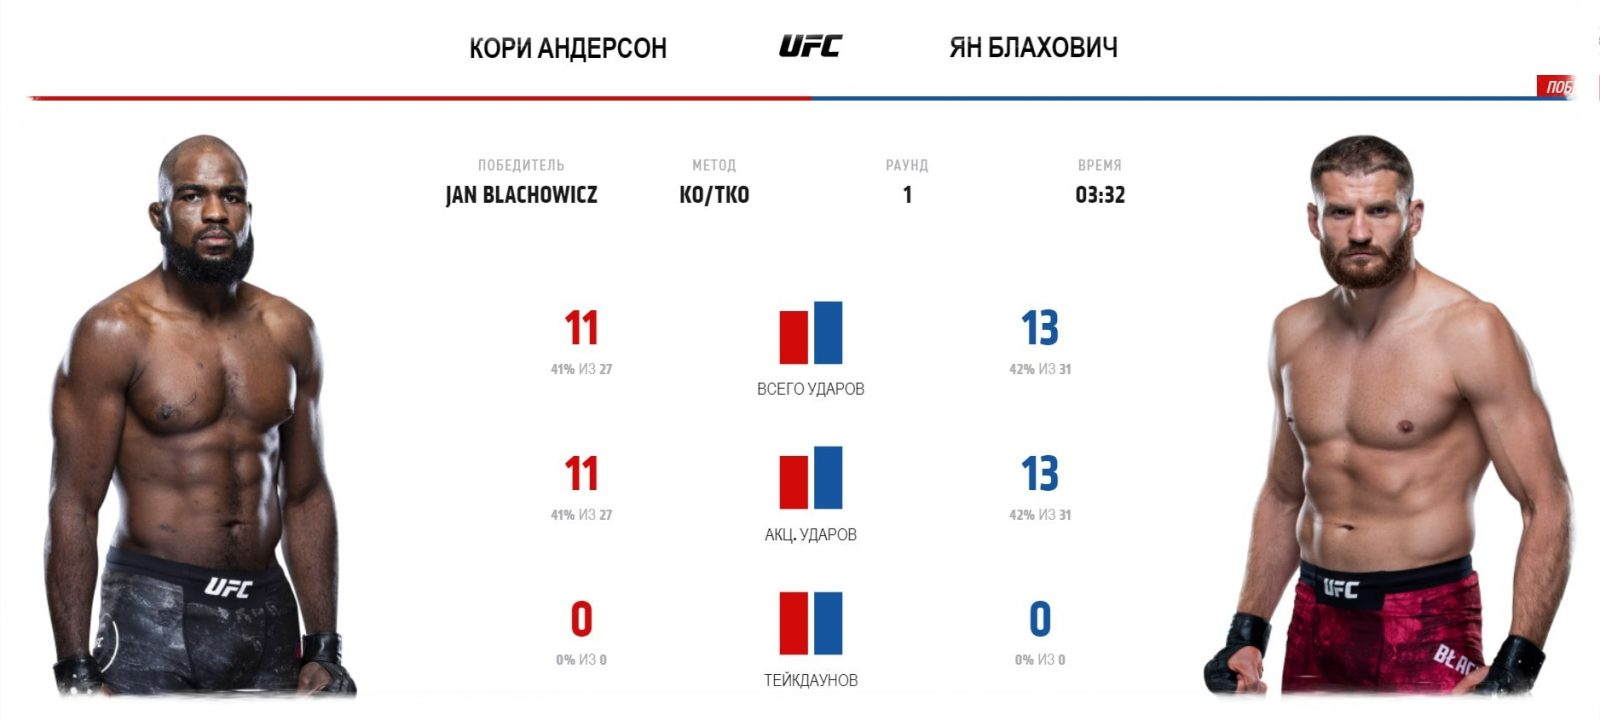 video-boya-kori-anderson-yan-blahovich-2-corey-anderson-jan-b-achowicz-2-ufc-fight-night-167